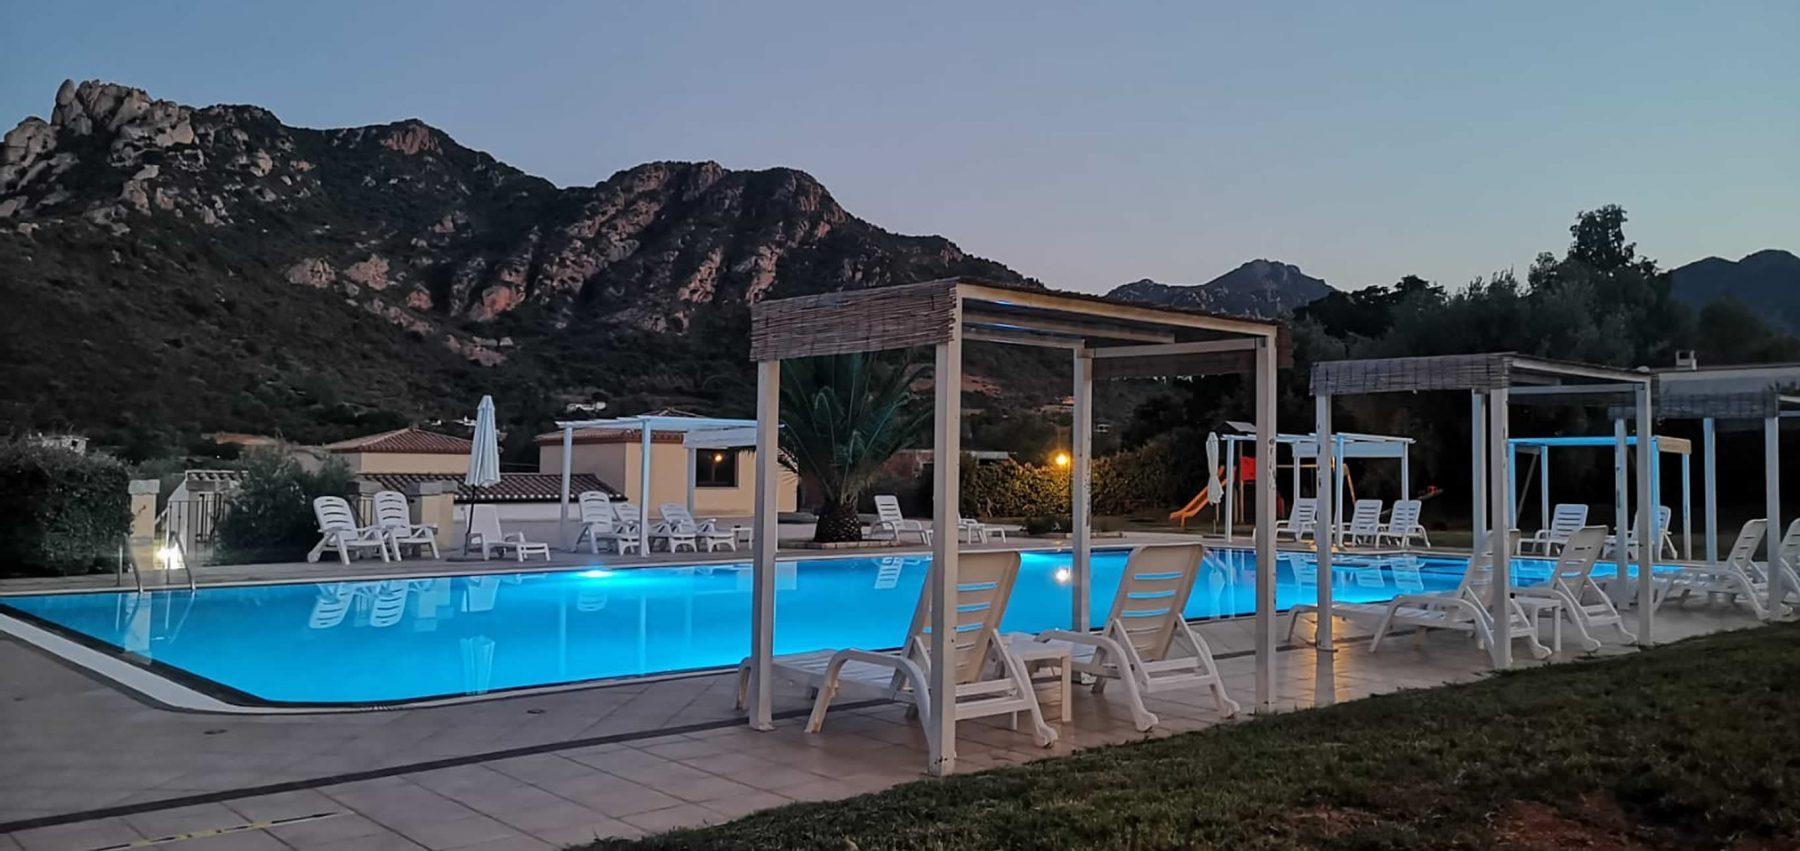 hotel-cardedu-ogliastra-sardegna-la-piscina6